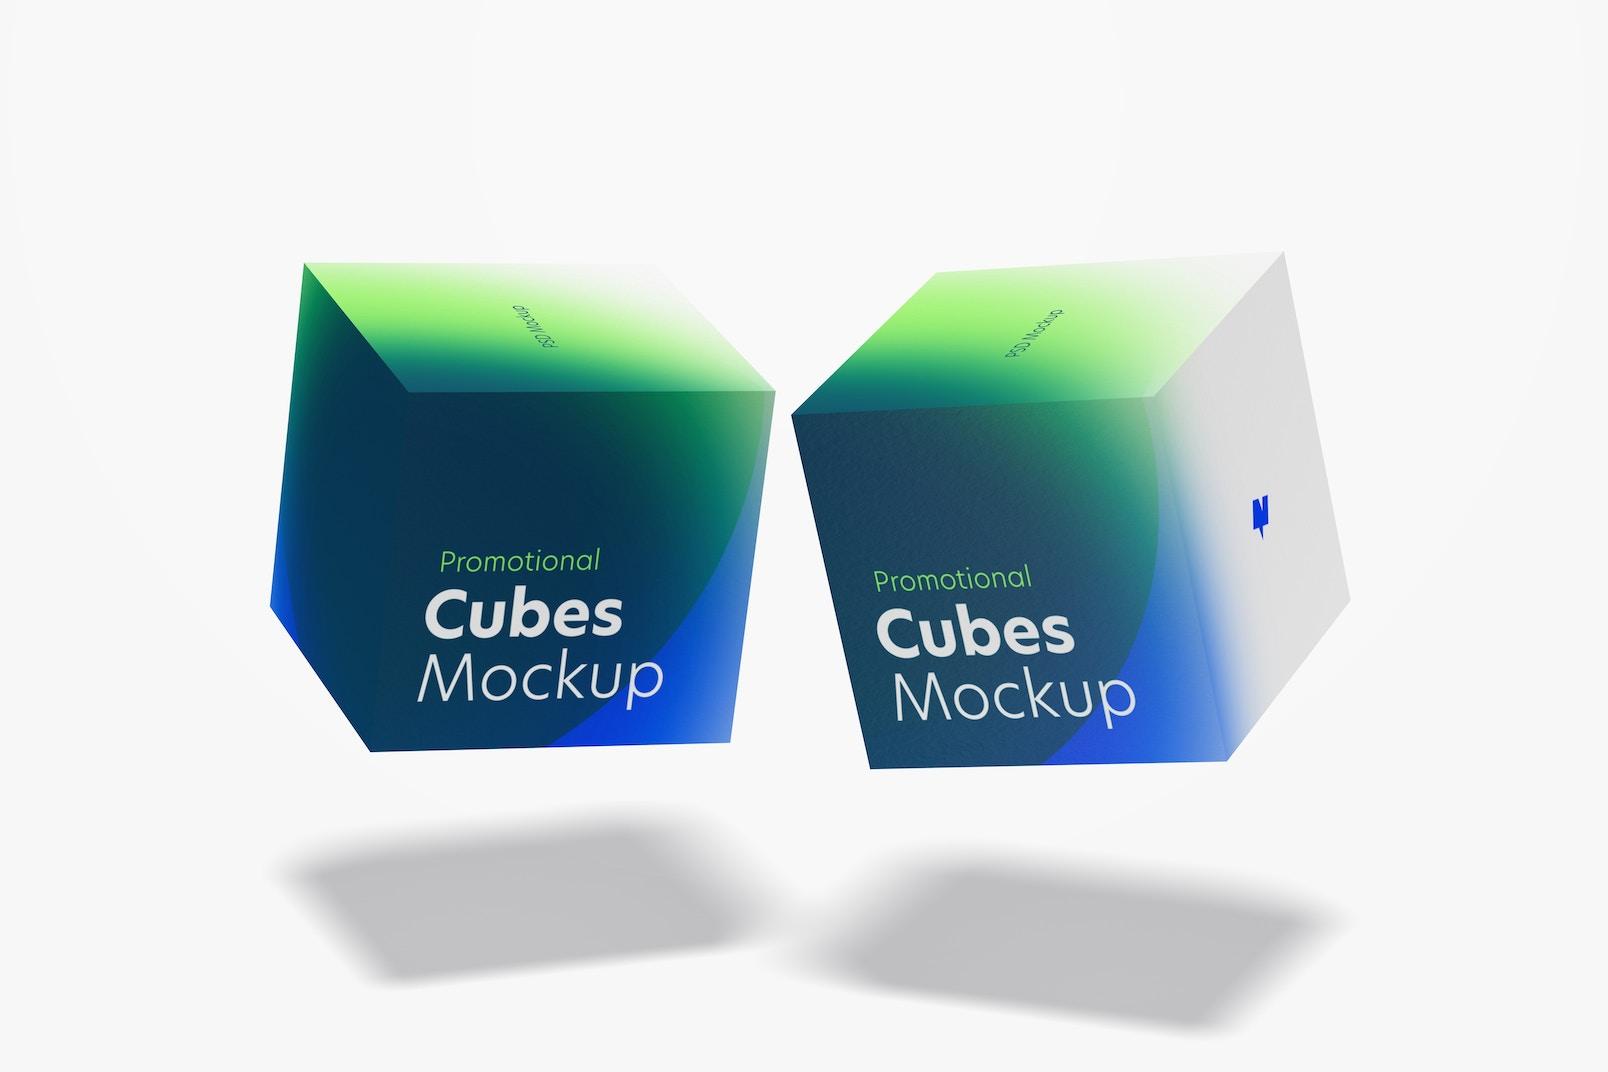 Promotional Cubes Display Mockup, Floating